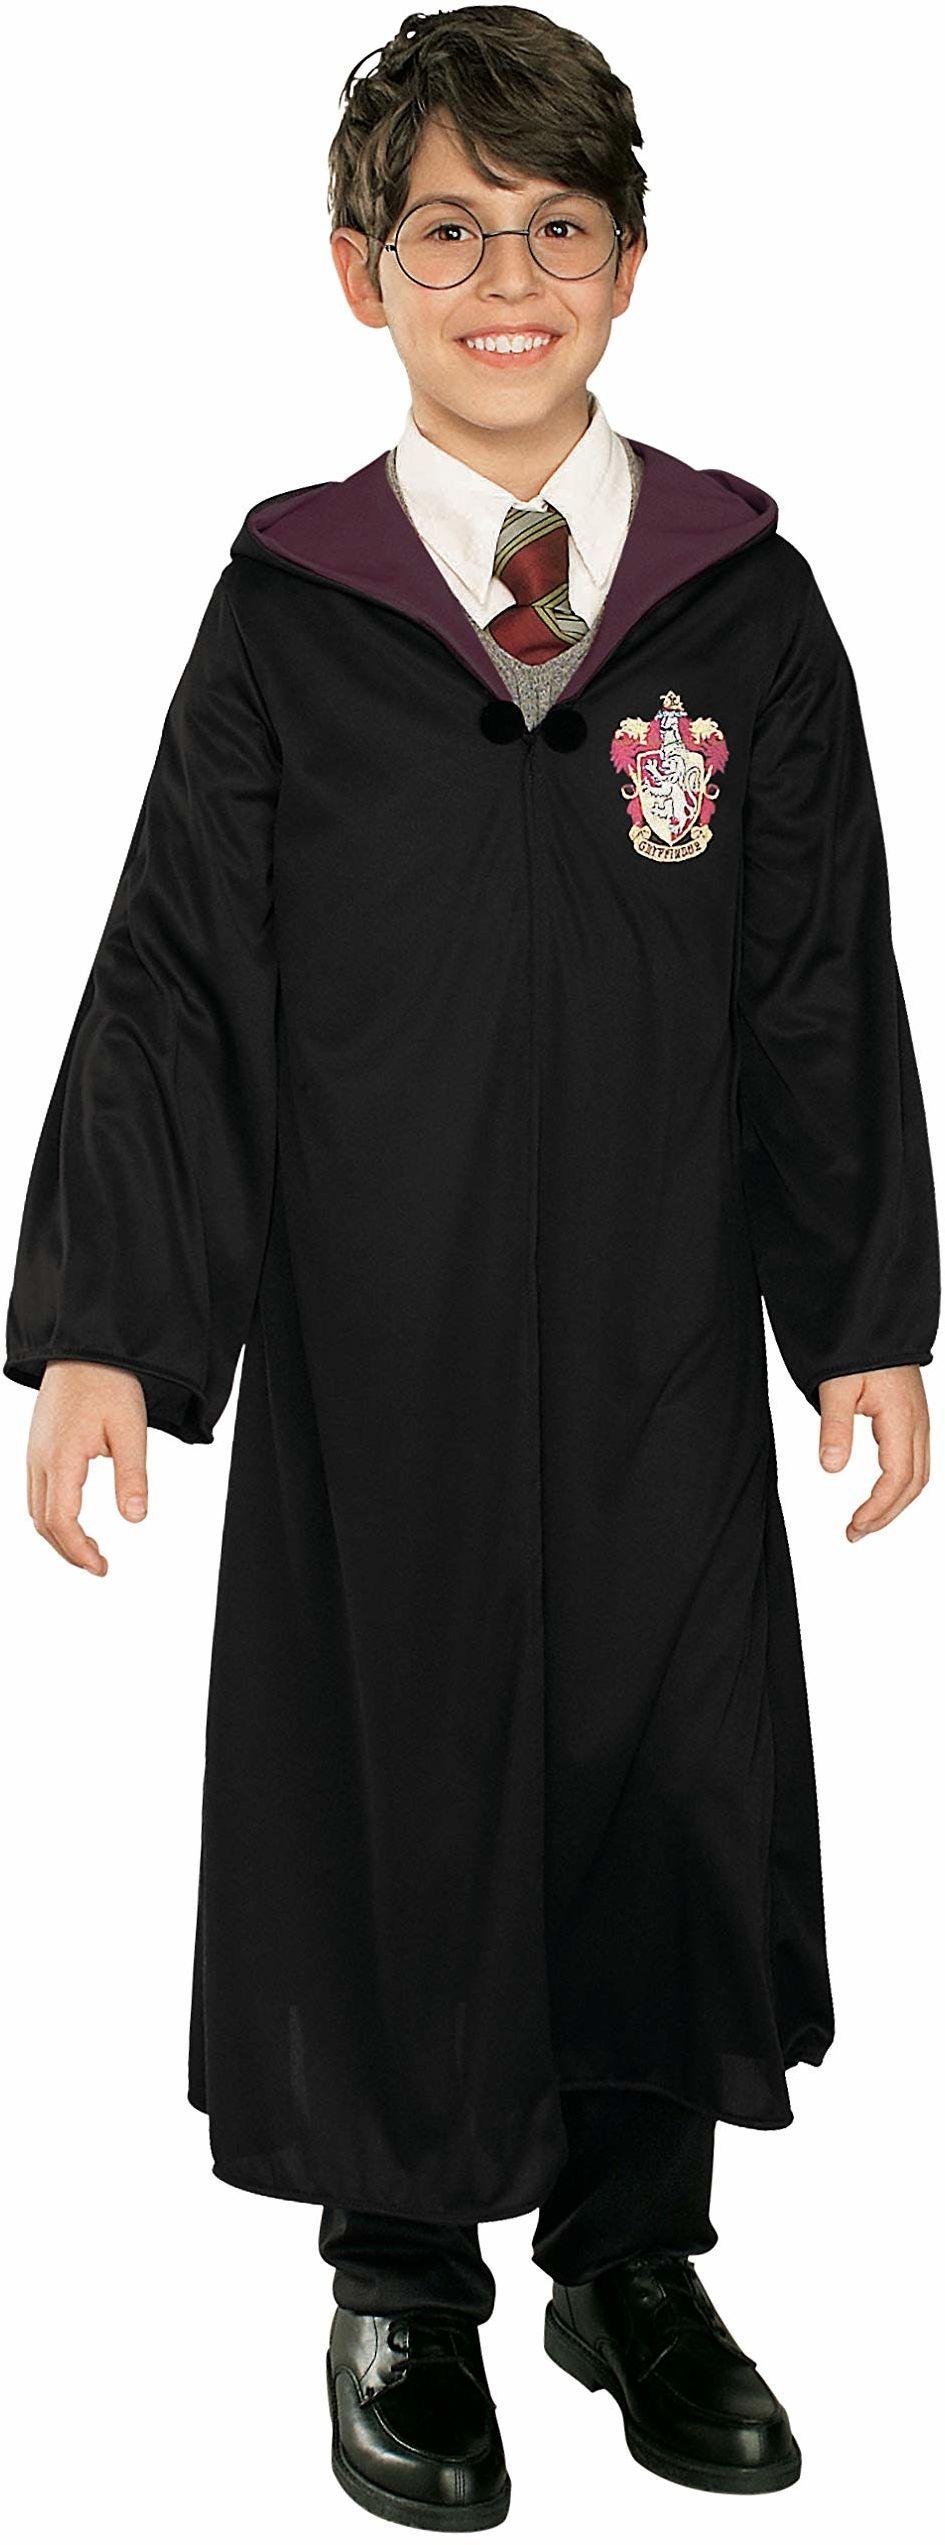 Rubie''s 3 883284-2 - Harry Potter Robe duża: M